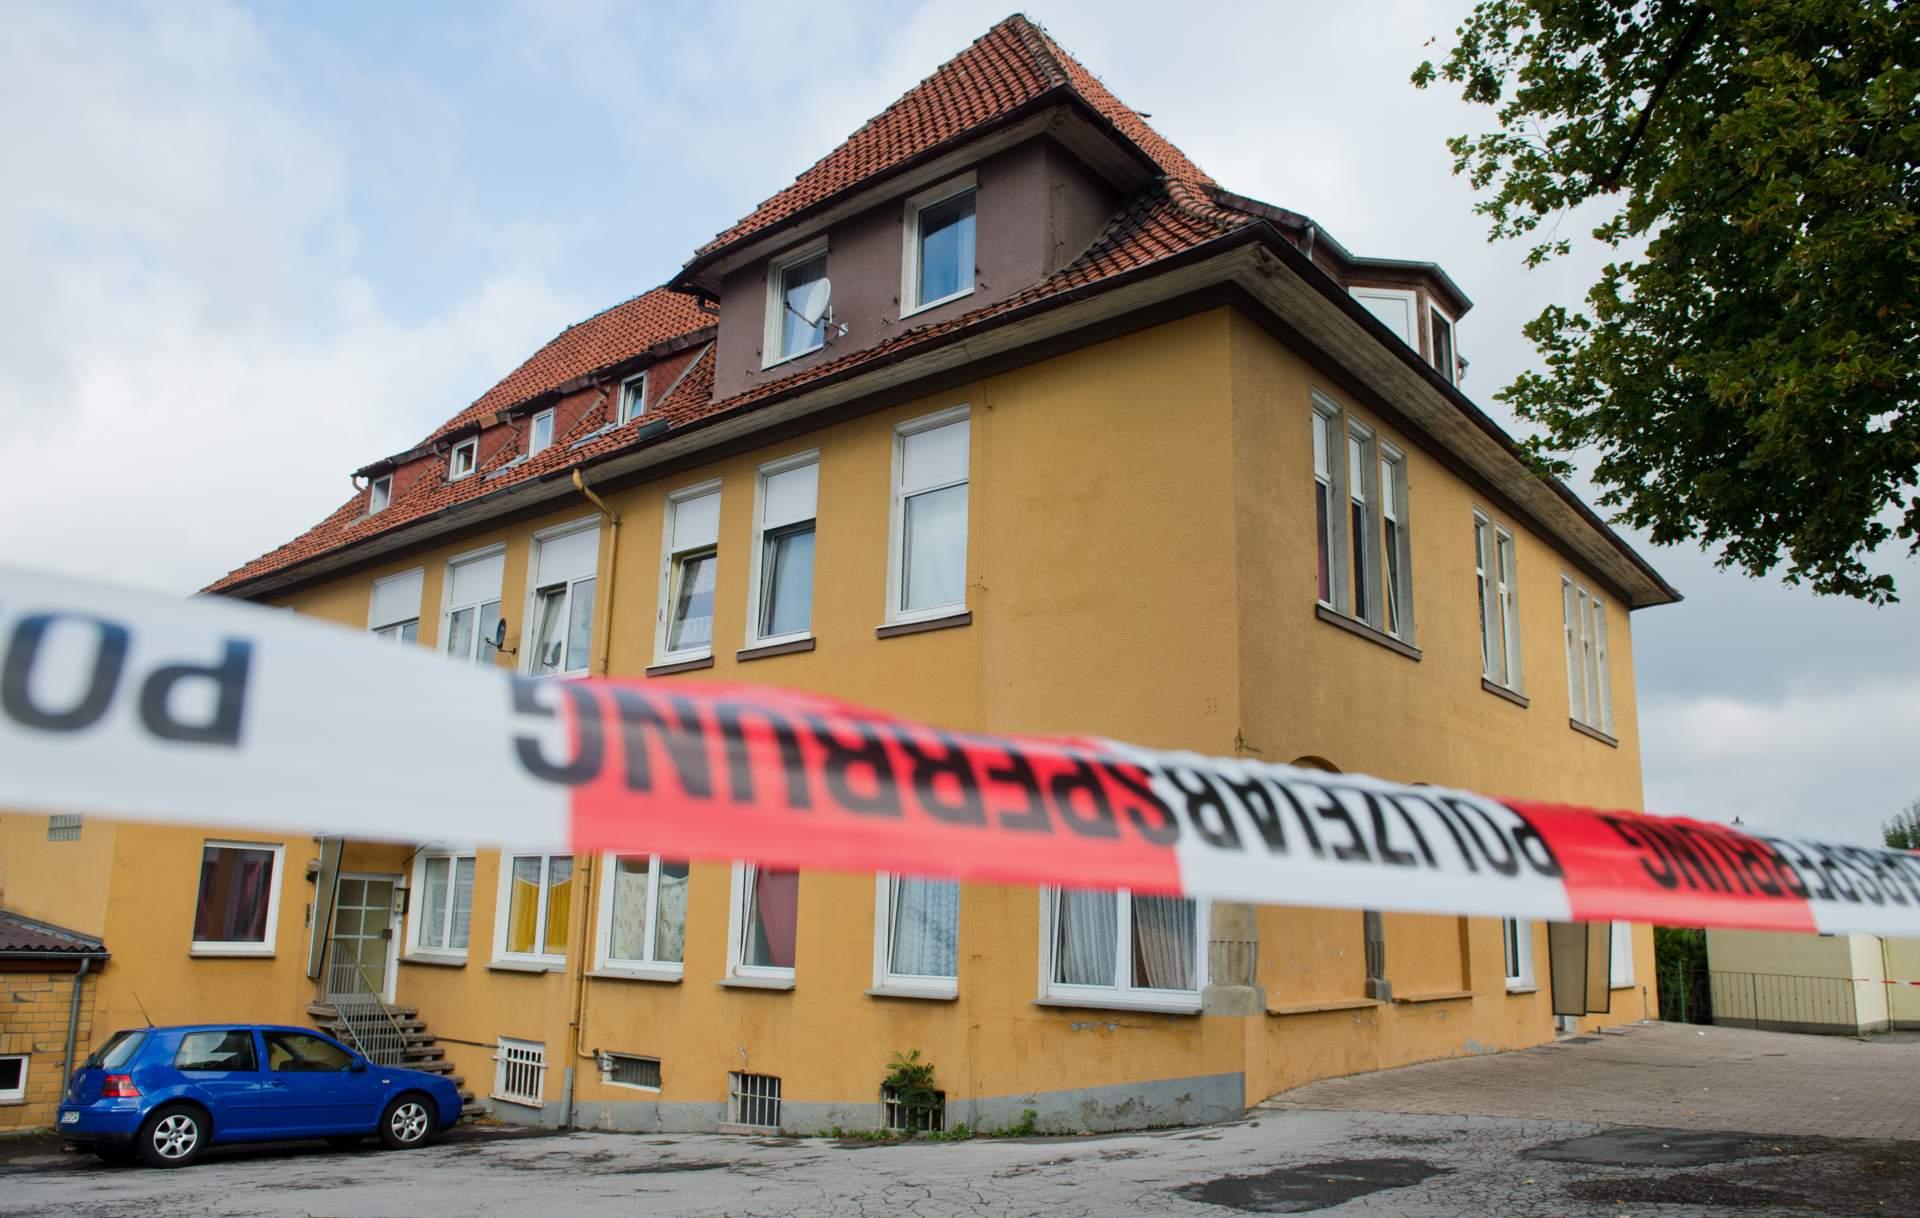 Versicherer kuendigt Schutz fuer Fluechtlingsunterkunft master reference